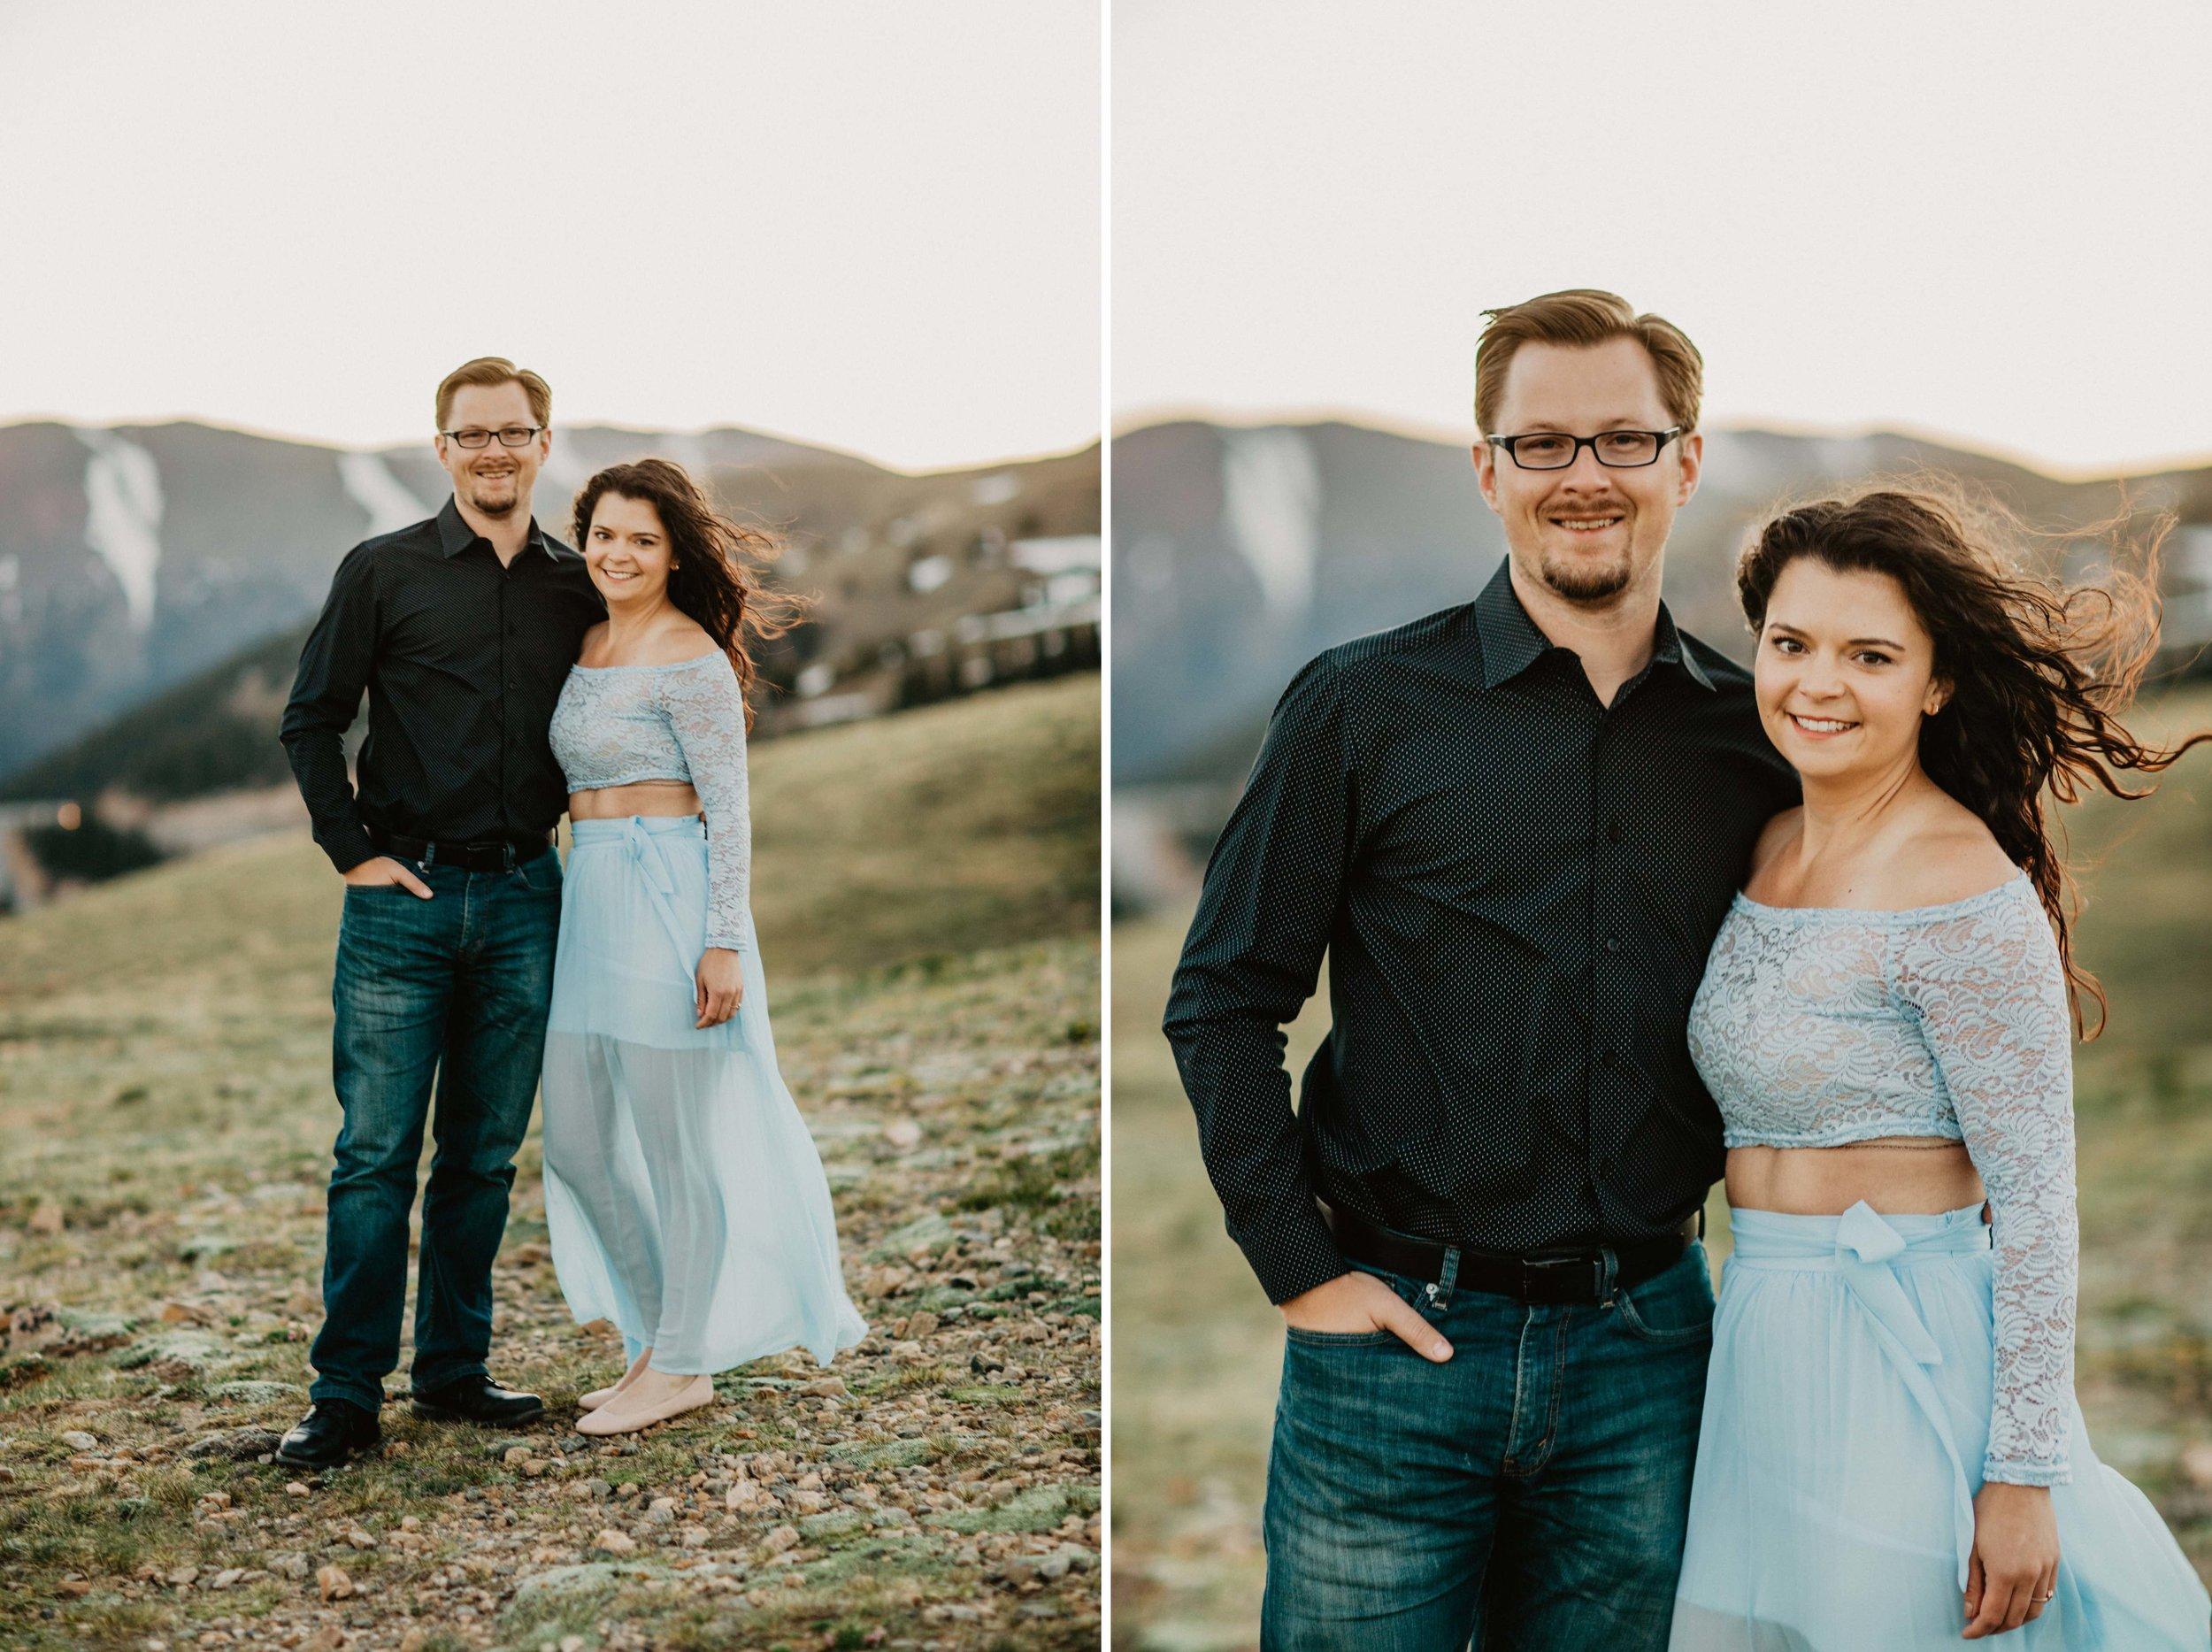 Kisa Conrad Favorites-colorado-wedding-photographer-denver-springs-vail-.jpeg